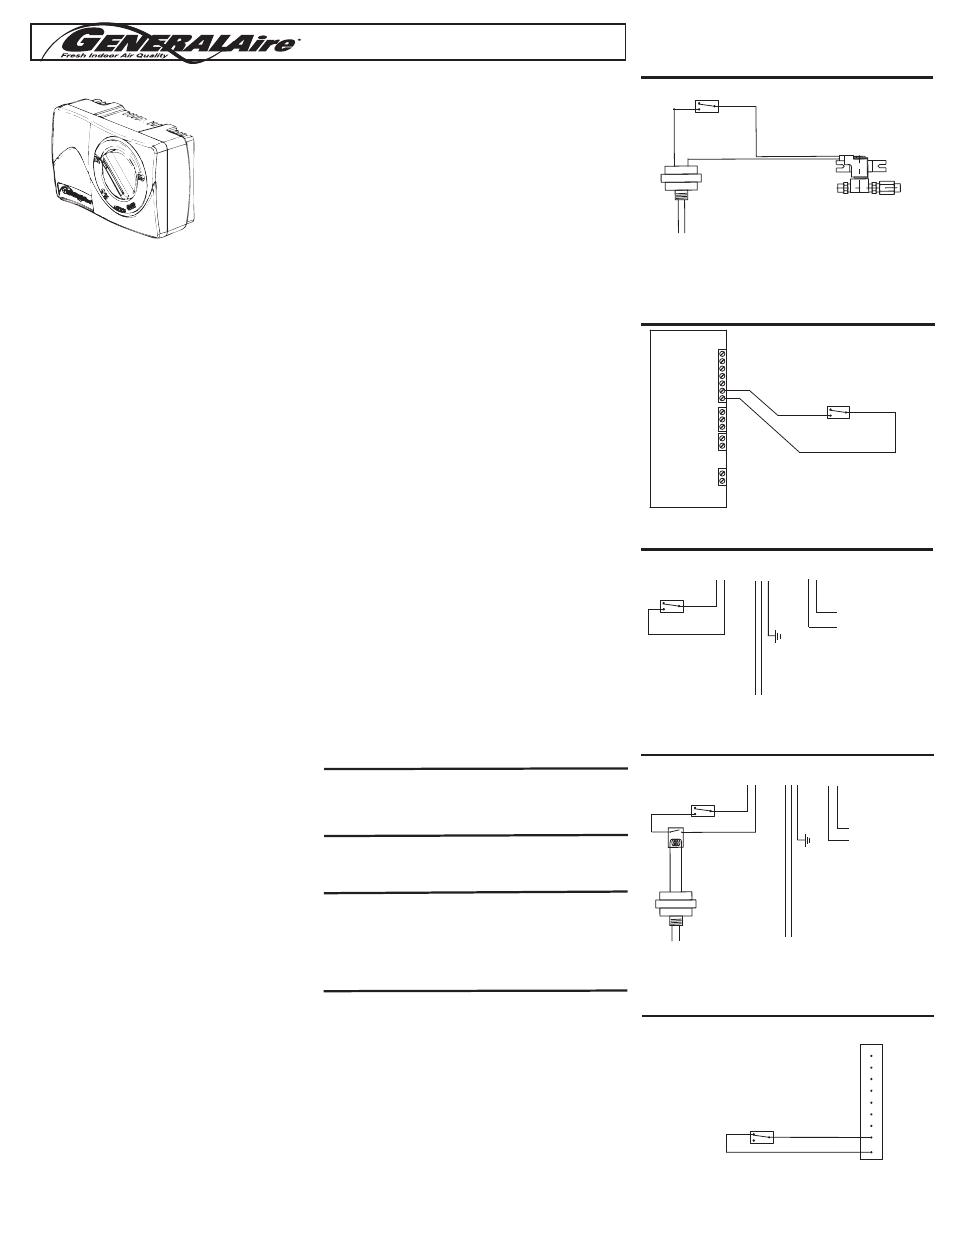 general 1137 wiring diagram